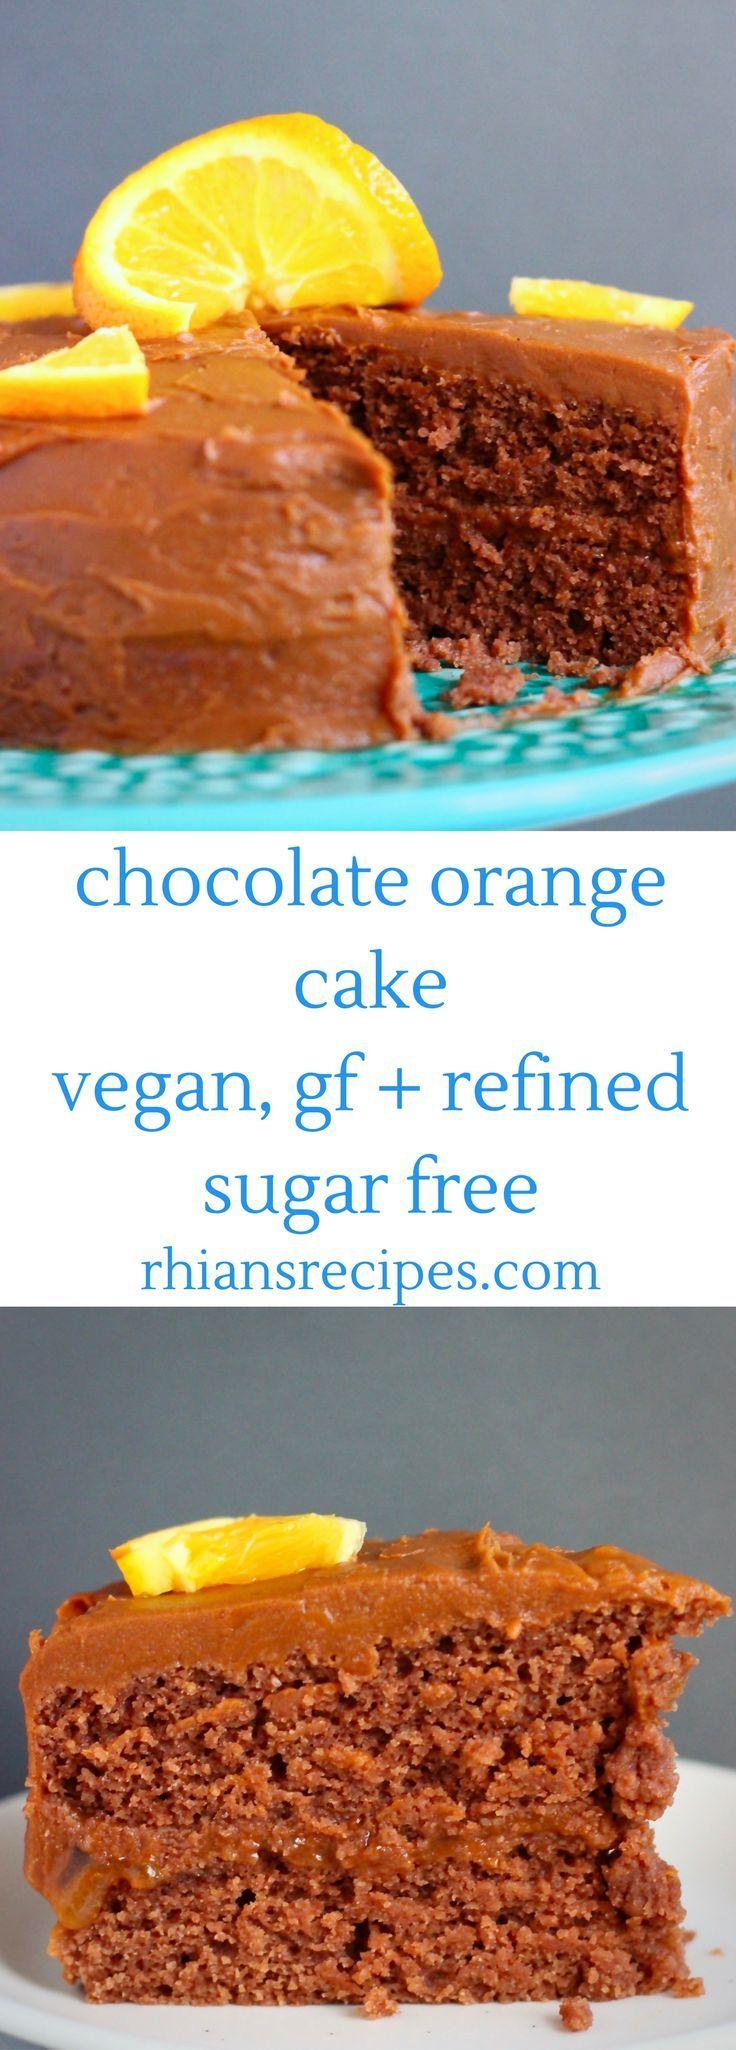 Best 25+ Chocolate orange cakes ideas on Pinterest ...